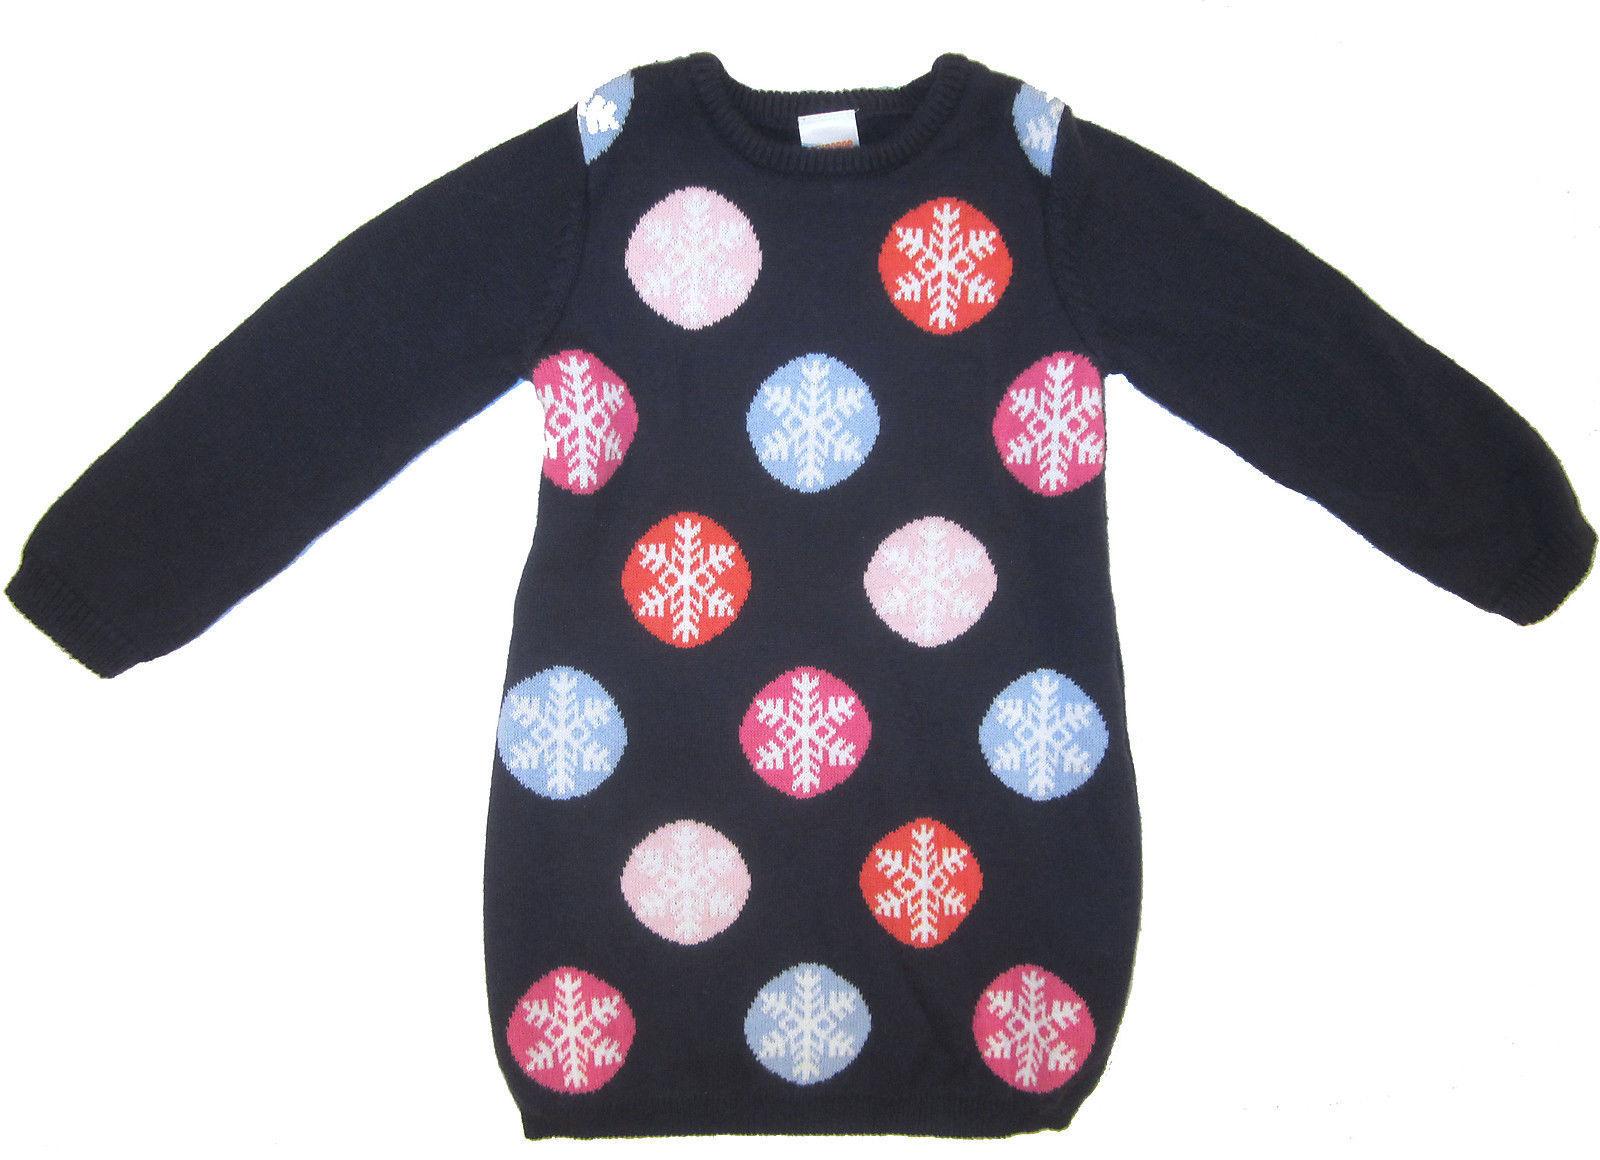 6abb606a5cc Gymboree Snowflake Sweater Dress sz 2T navy and 11 similar items. S l1600